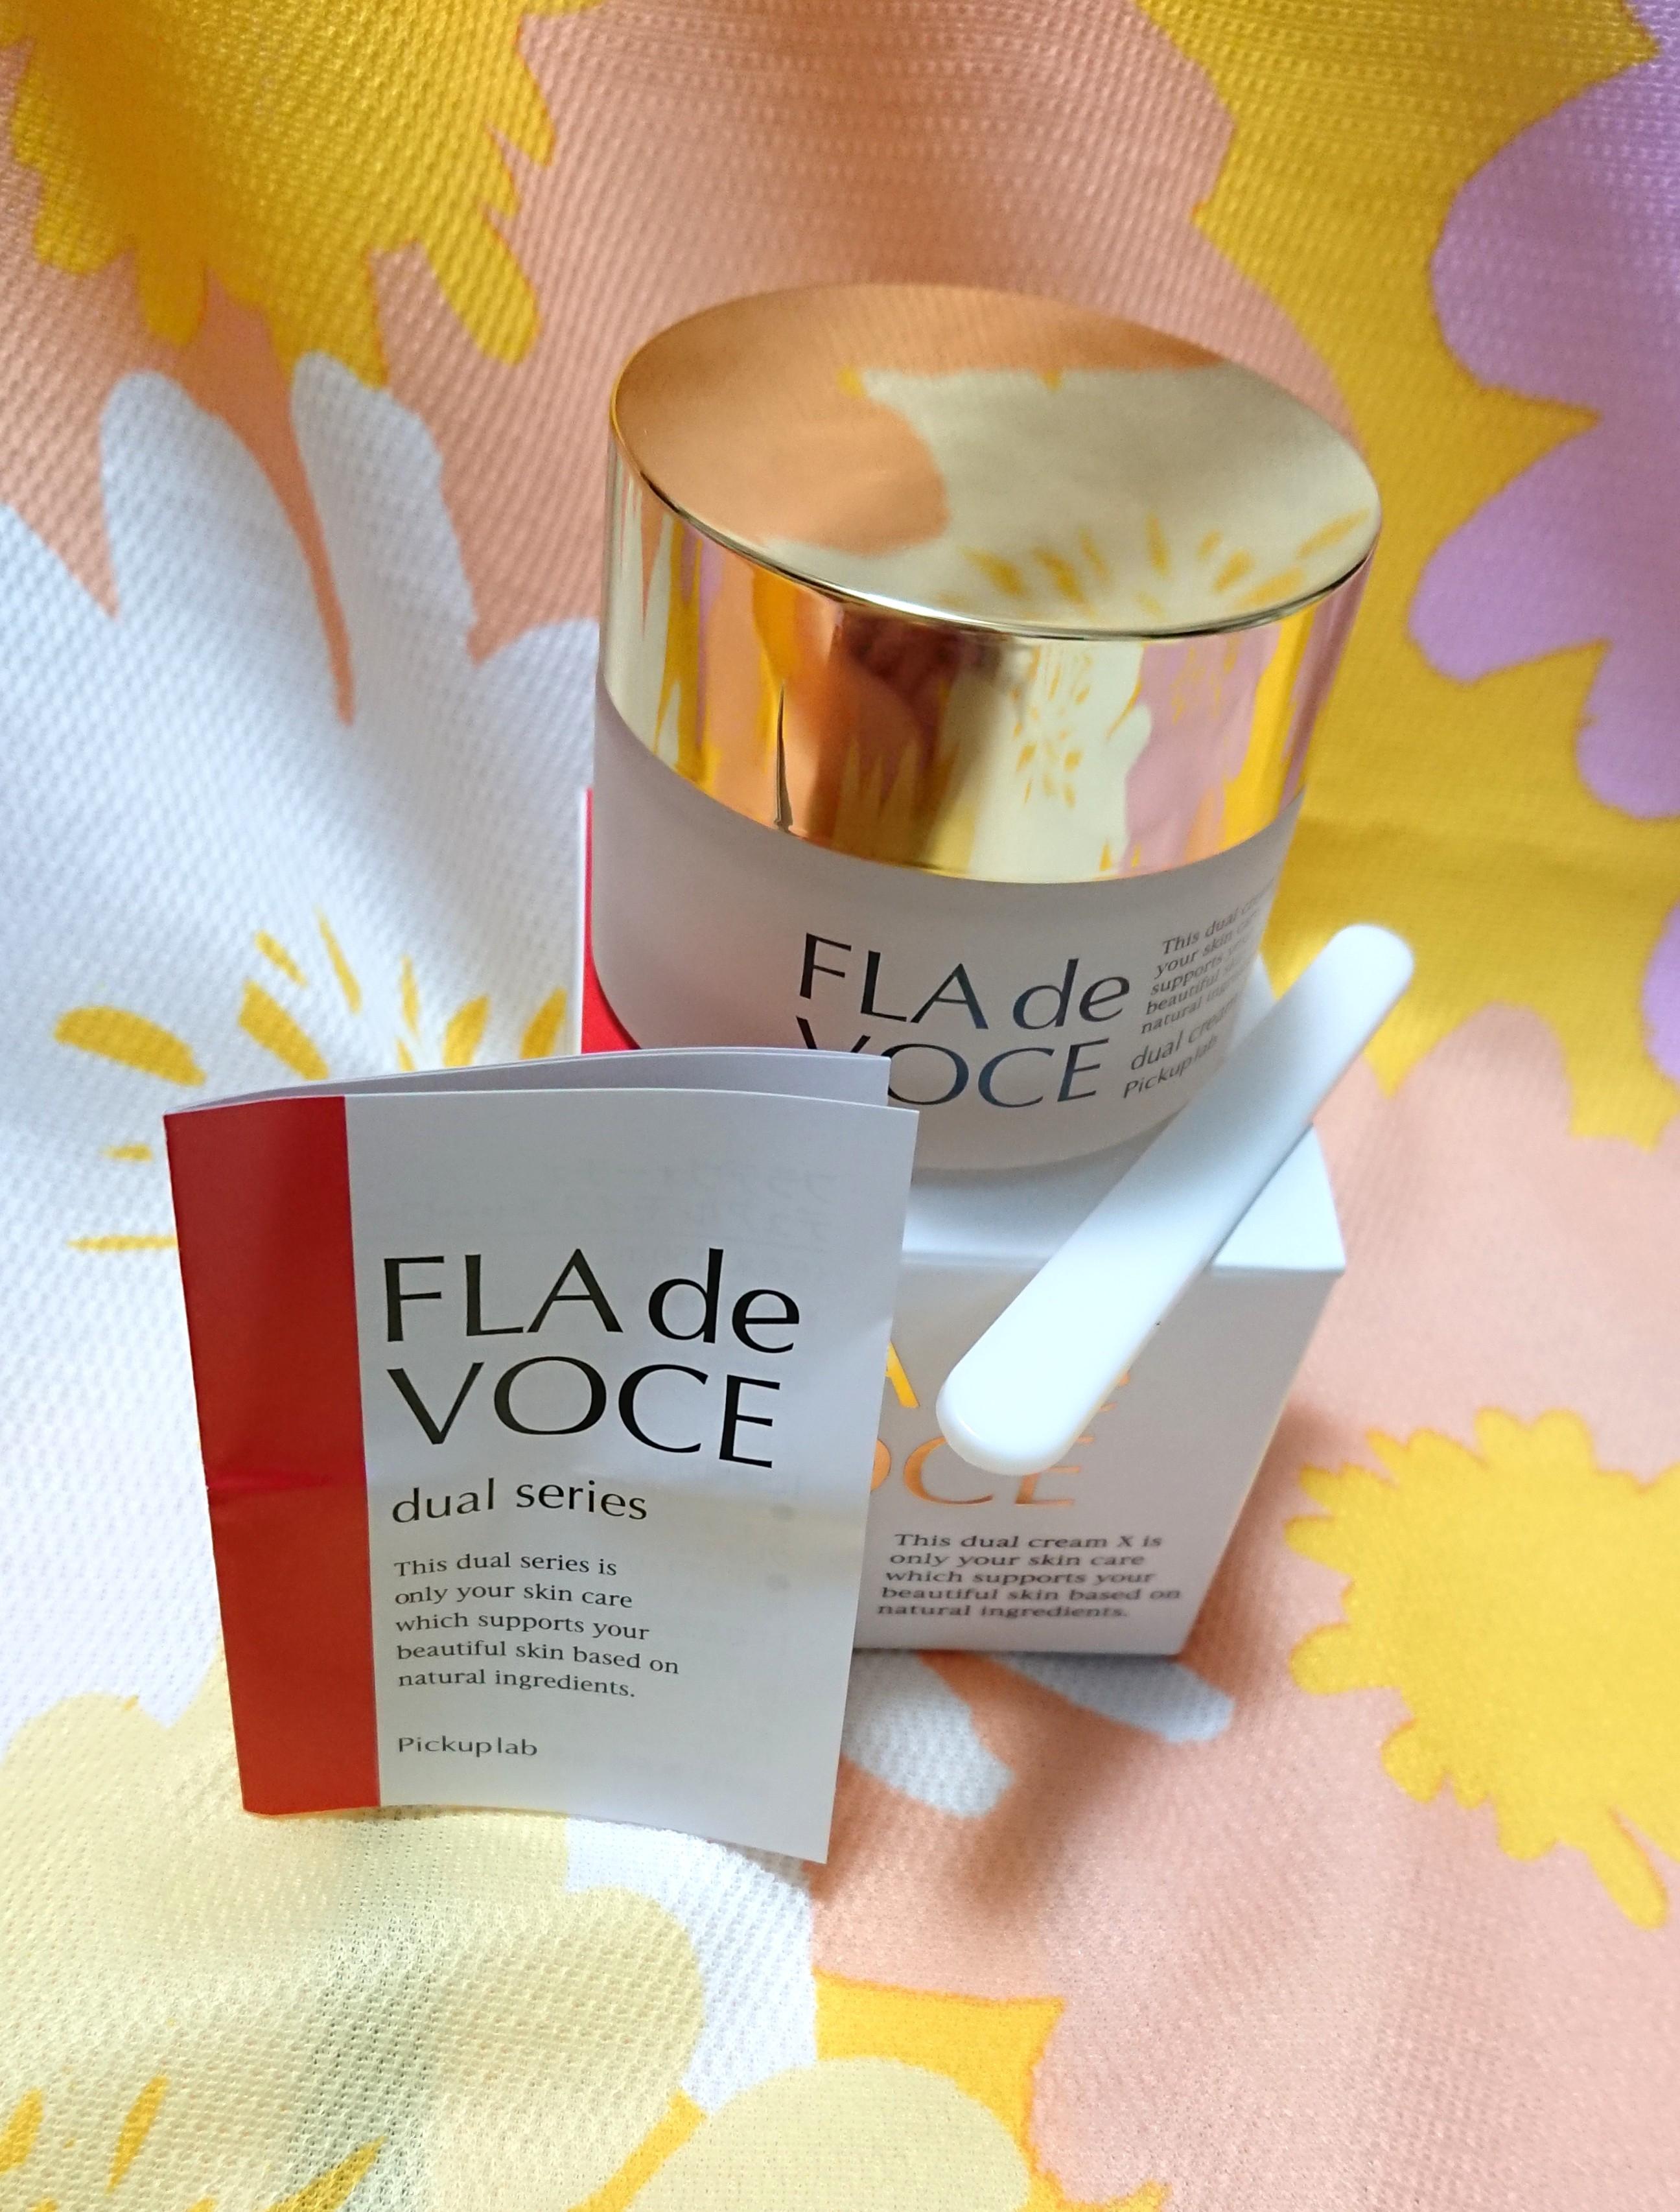 FLAdeVOCE(フラデヴォーチェ) デュアルクリームⅩの良い点・メリットに関する恵未さんの口コミ画像1